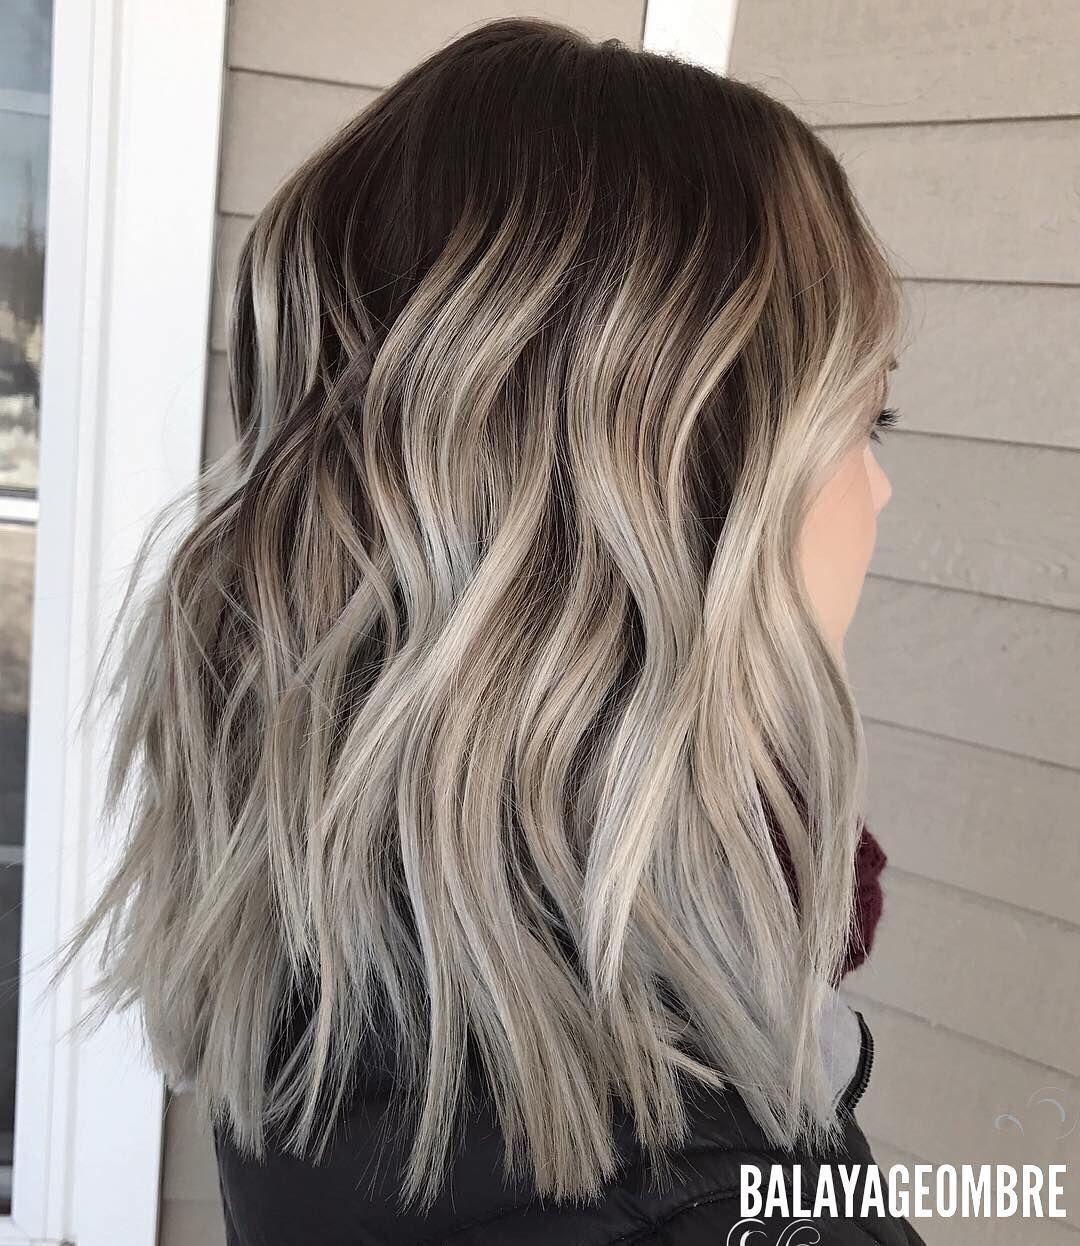 10 Best Medium Layered Hairstyles 2021 Brown Ash Blonde Fashion Colors Orta Uzunlukta Sac Stilleri Kalin Saclar Sari Sac Renkleri